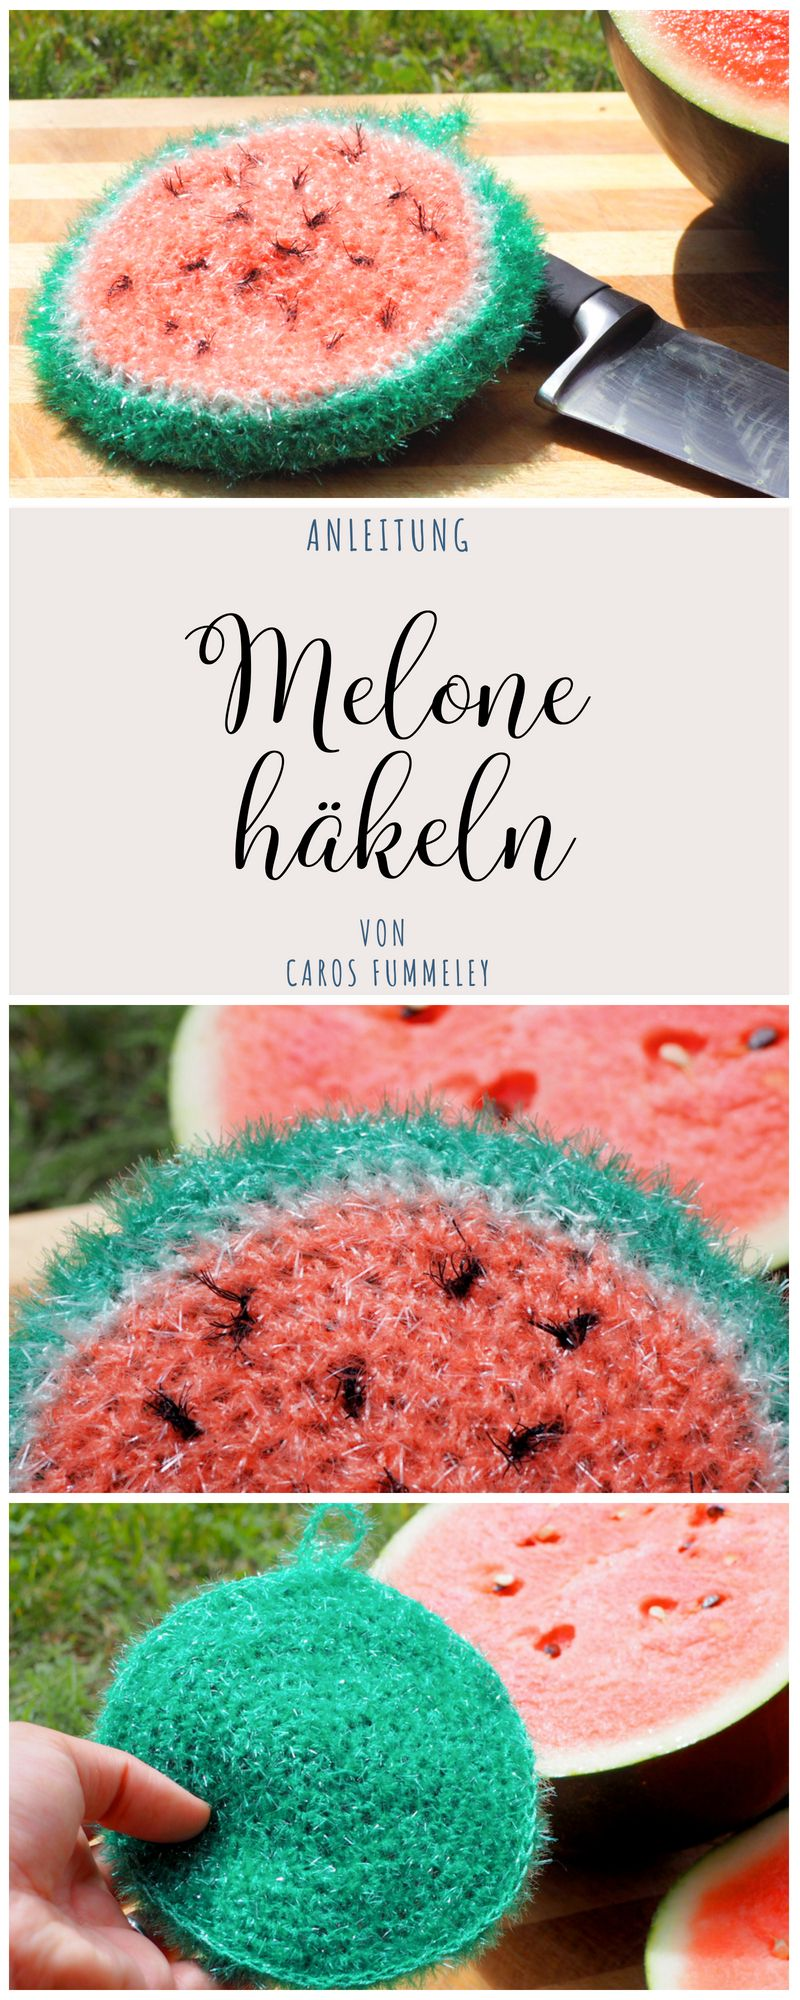 Melone Häkeln Spülschwamm Anleitung German Diy Blogger